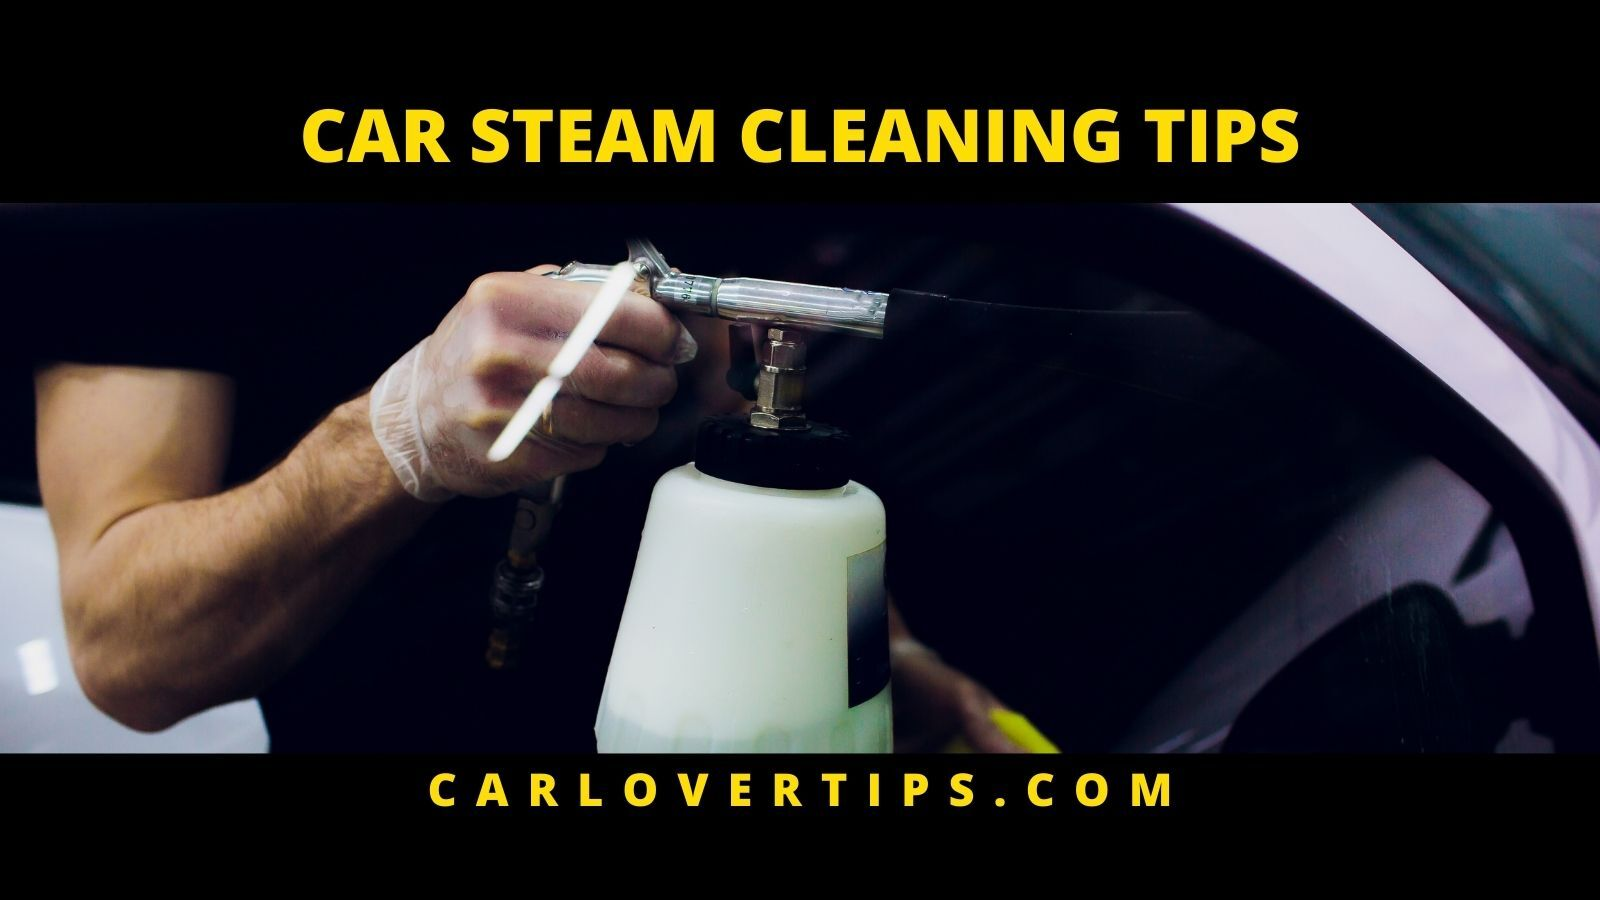 Best Car STEAM Cleaner Tips Car Lover Tips CAR